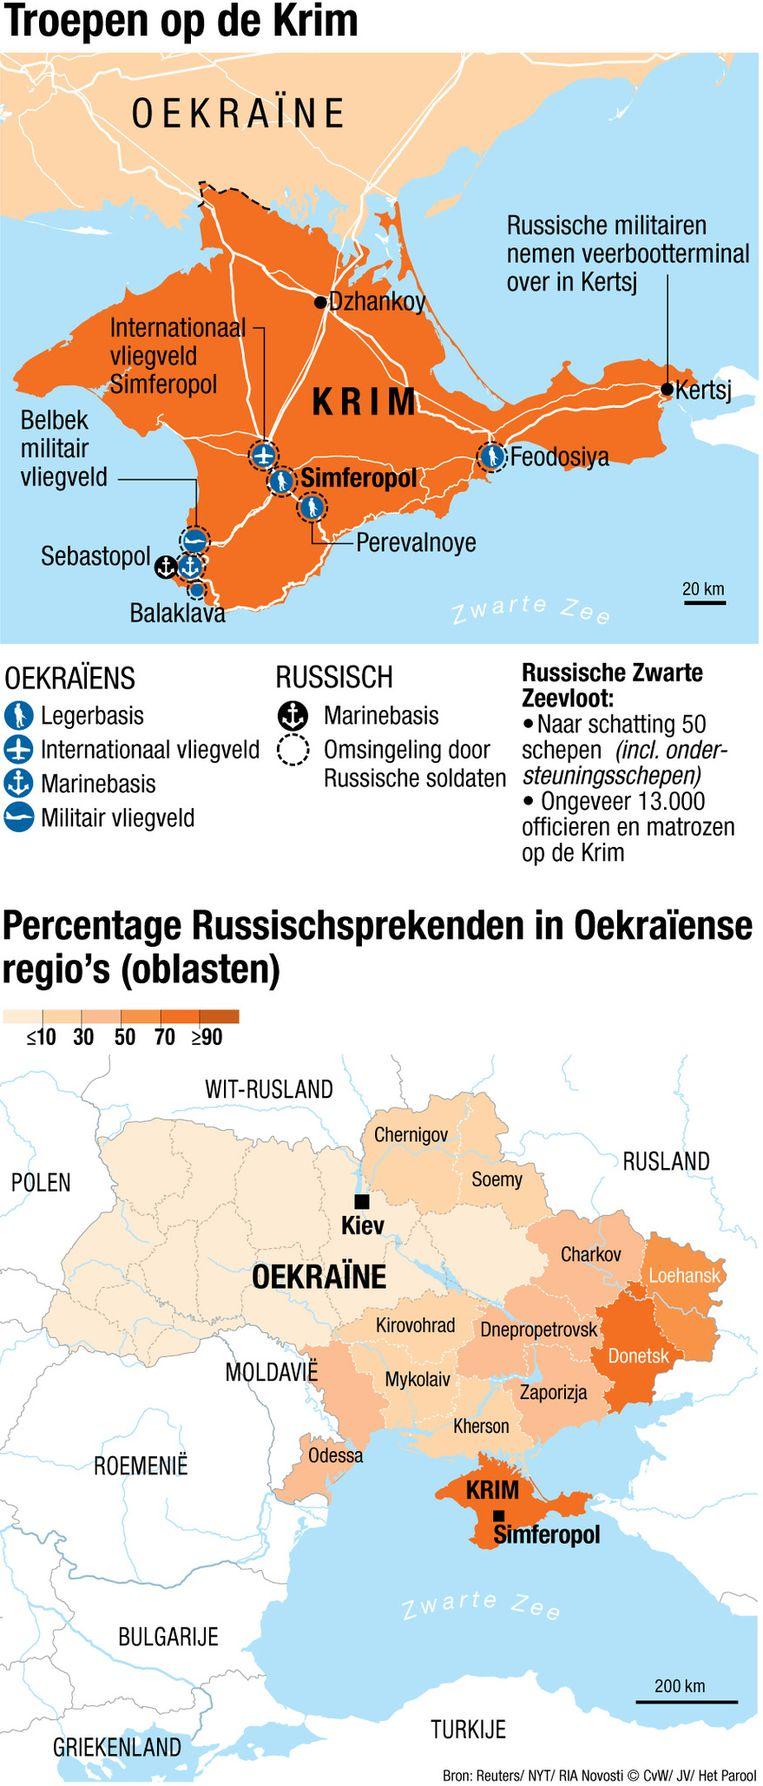 Troepen op de Krim Beeld Chantal Wessel en Jorris Verboon